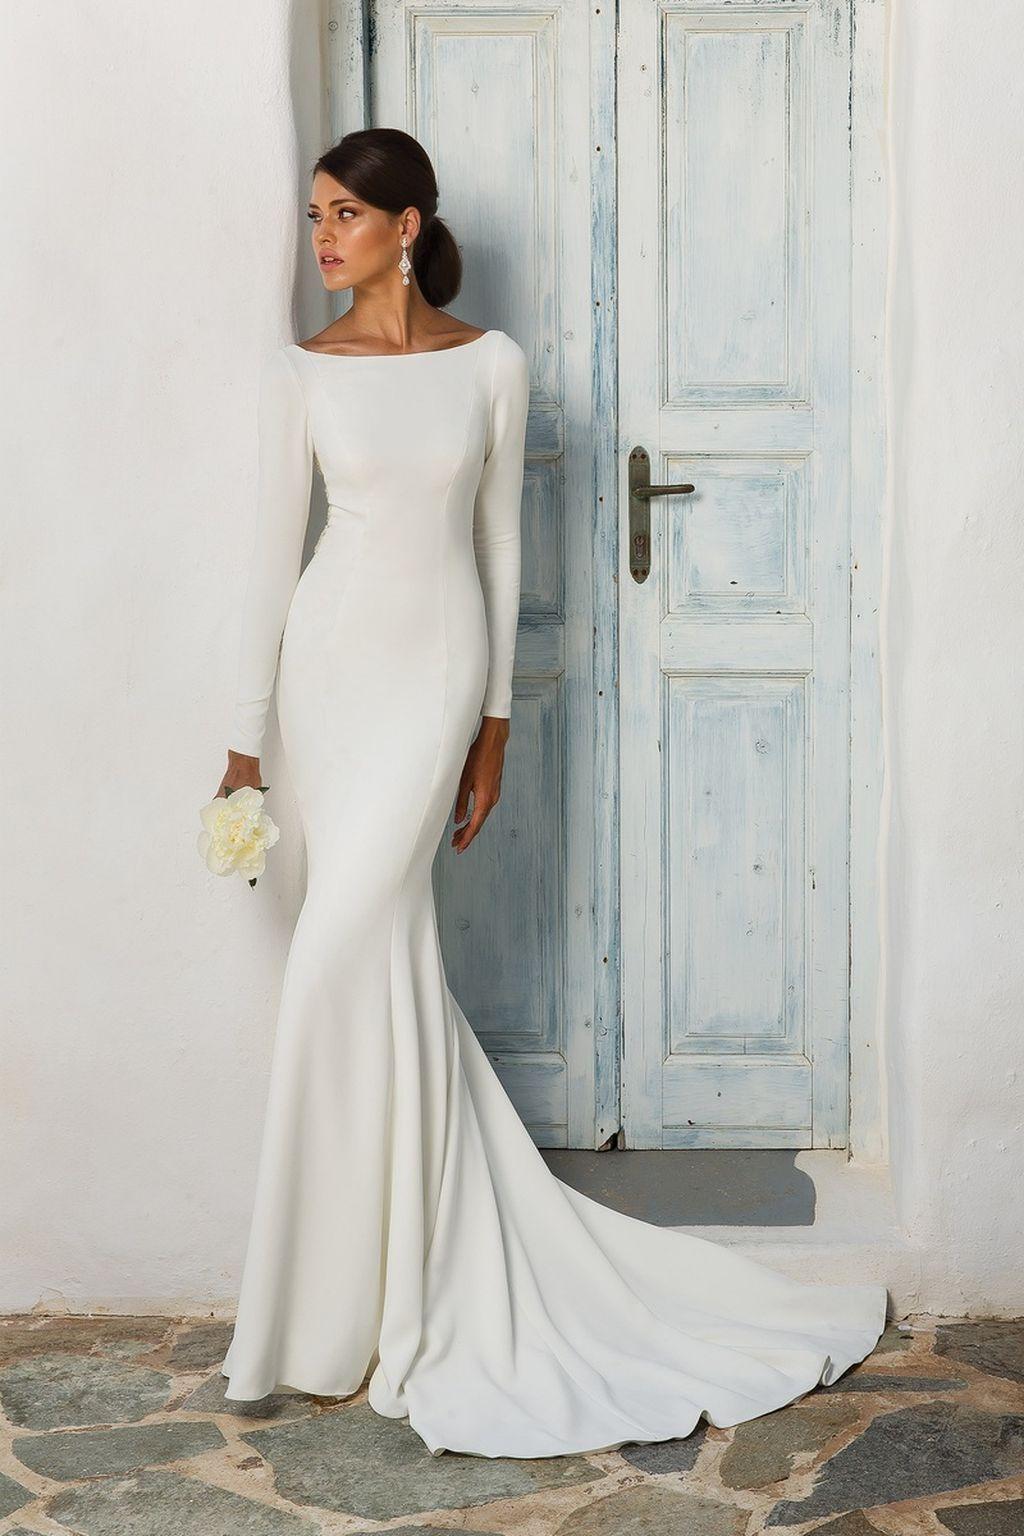 totally adorable long sleeve winter wedding dress ideas every